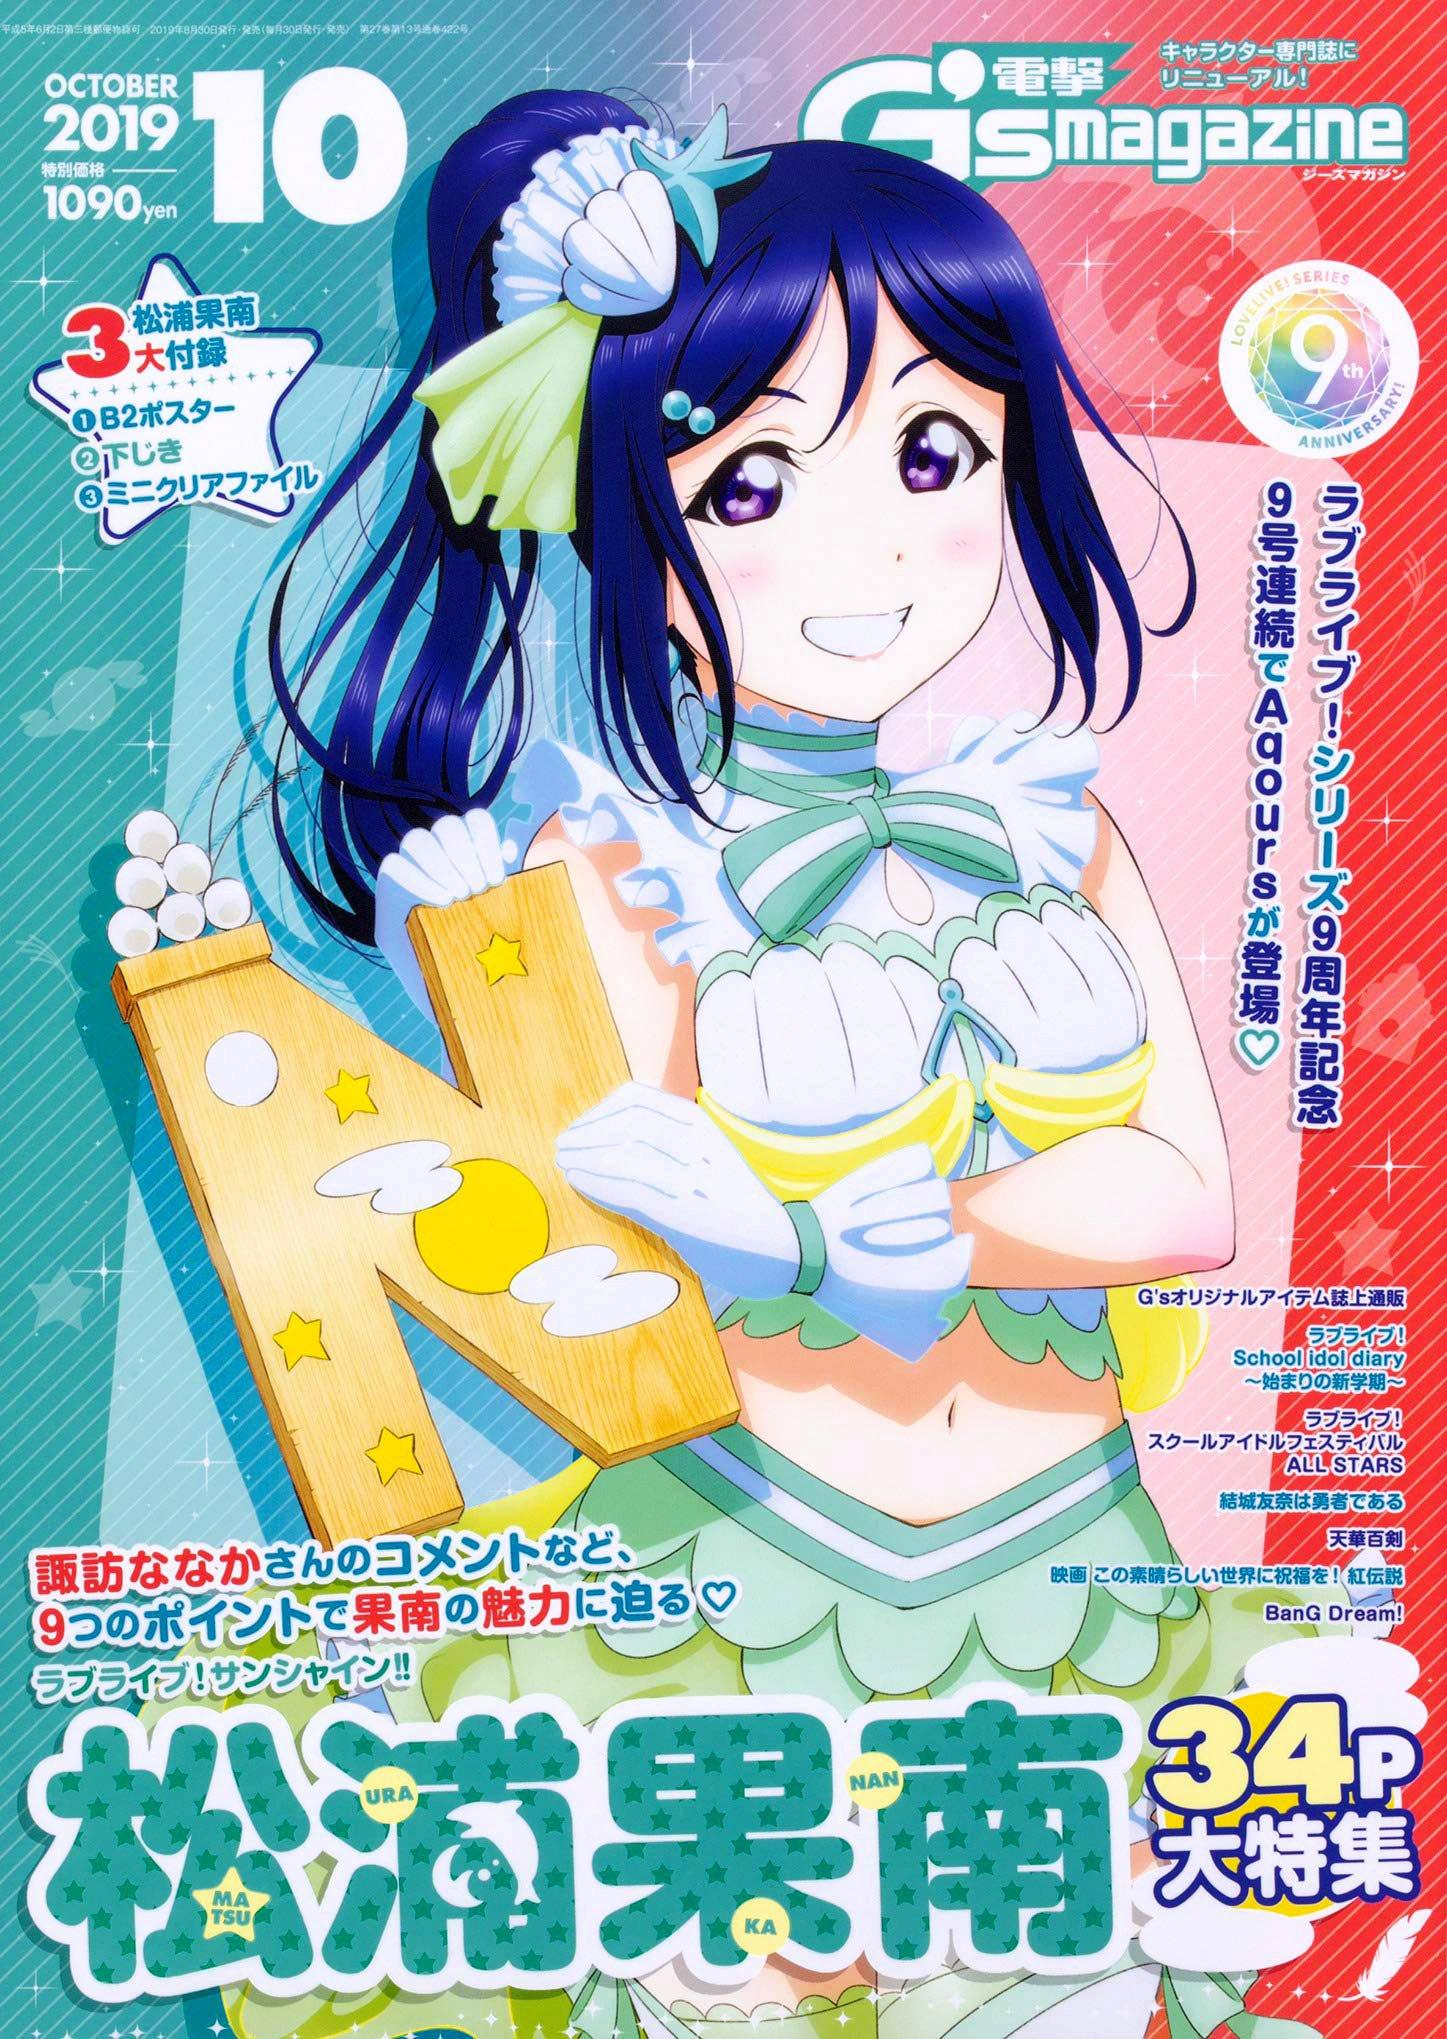 Dengeki G's Magazine Issue 267 (October 2019) (print edition)